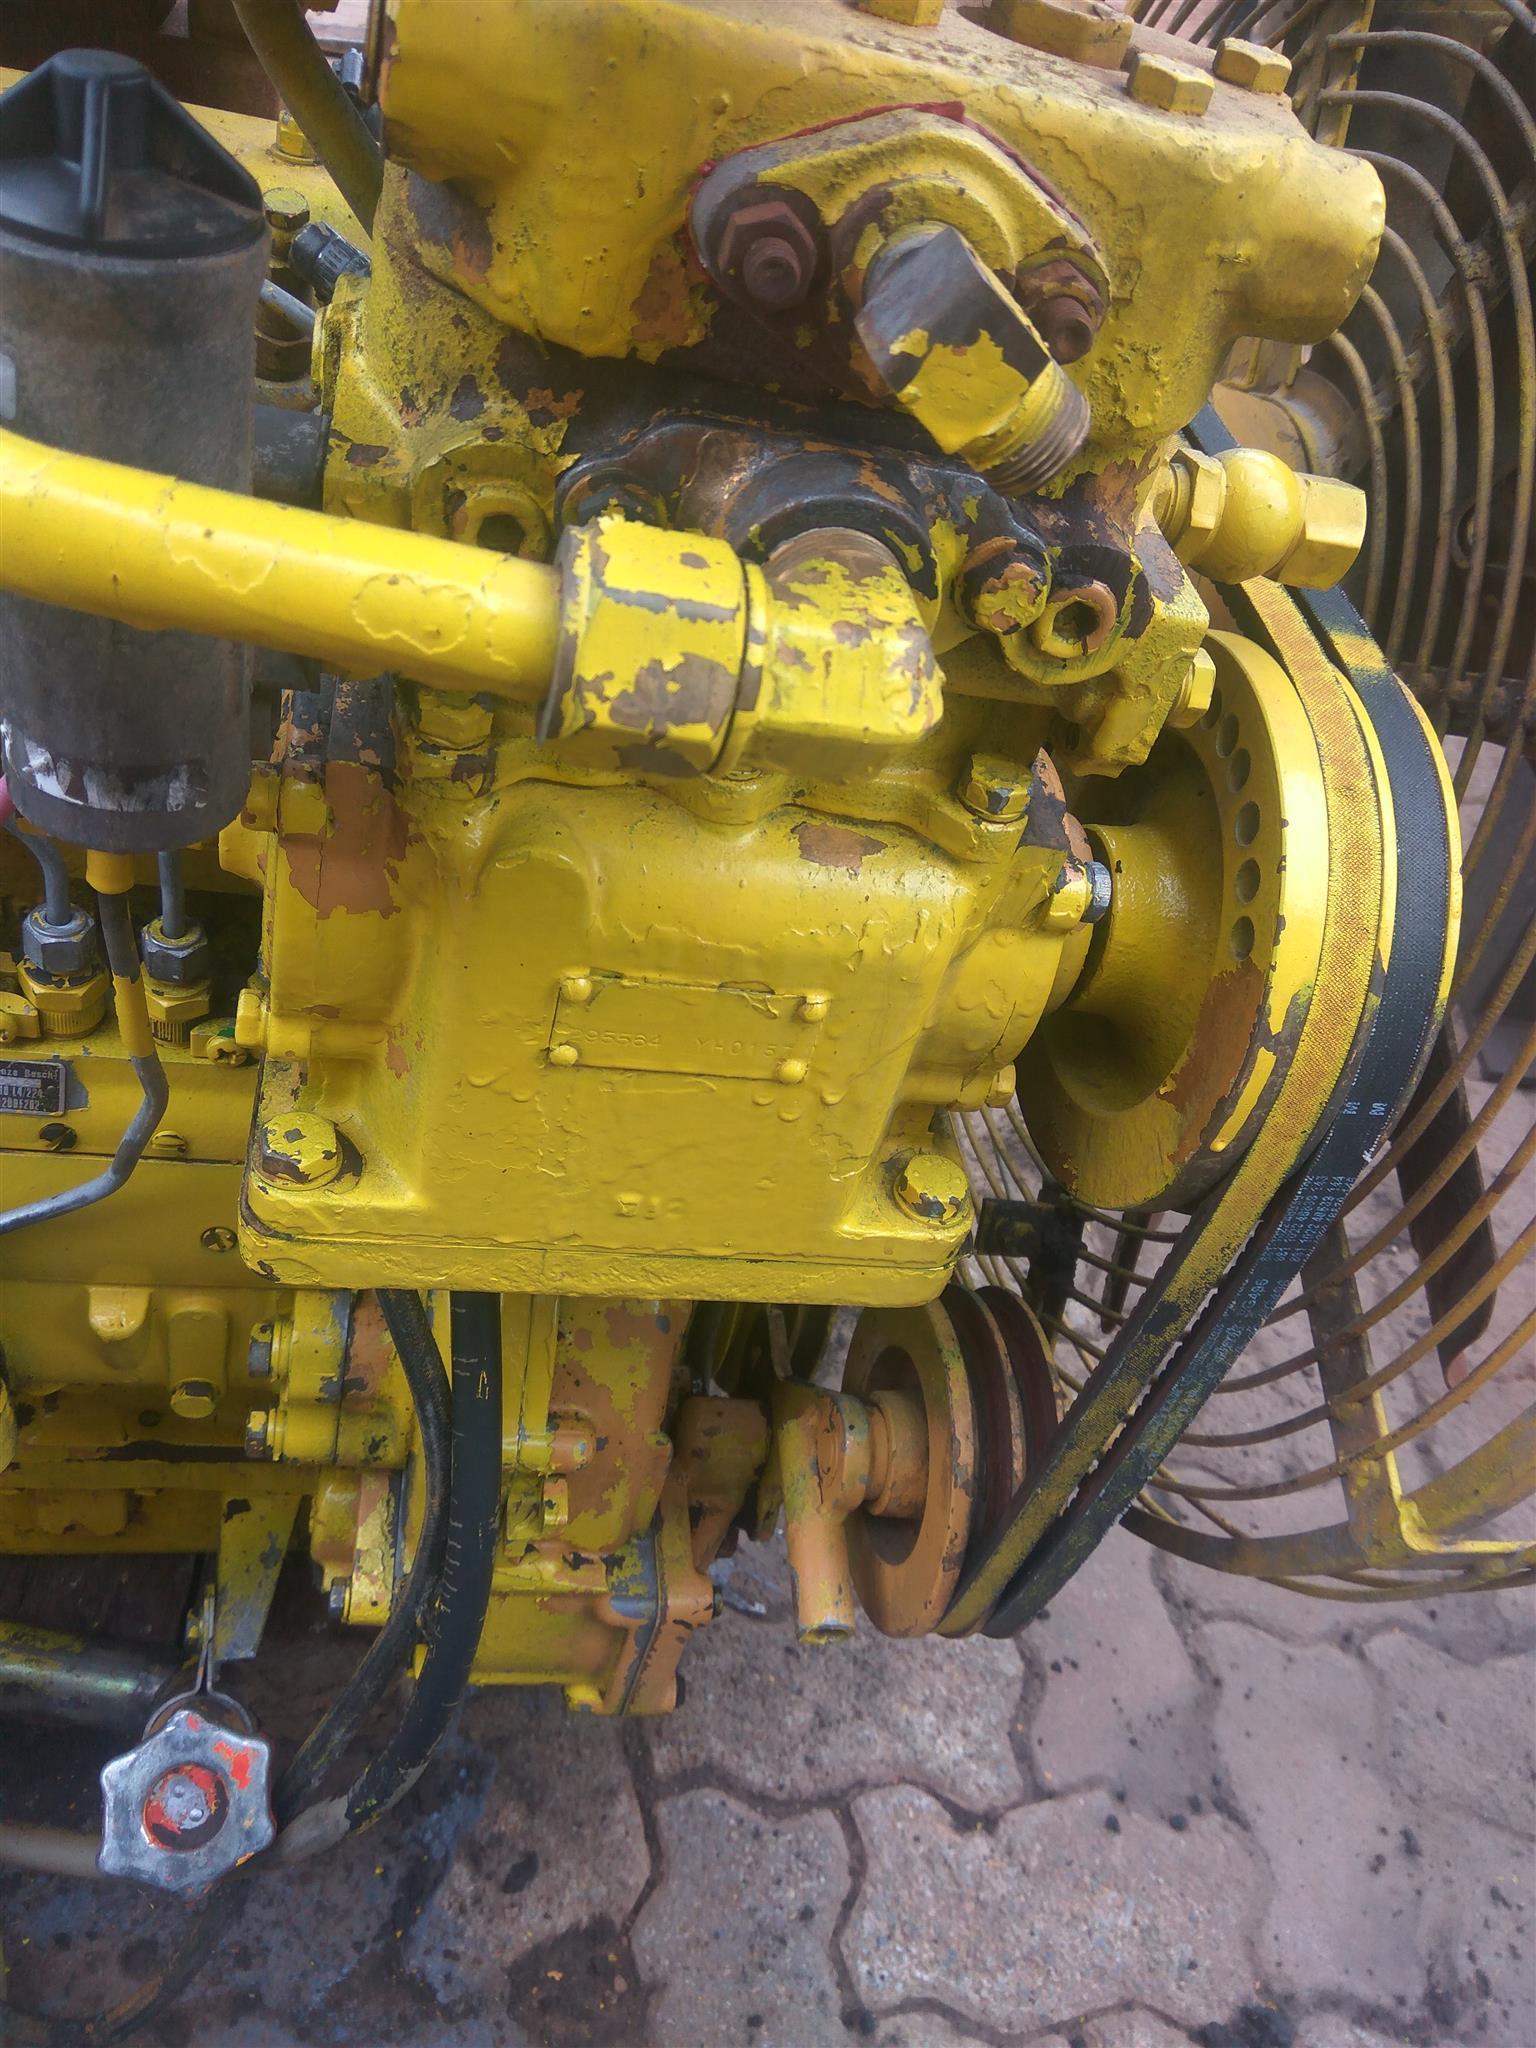 Fiat straight 6 Diesel Turbo motor for sale